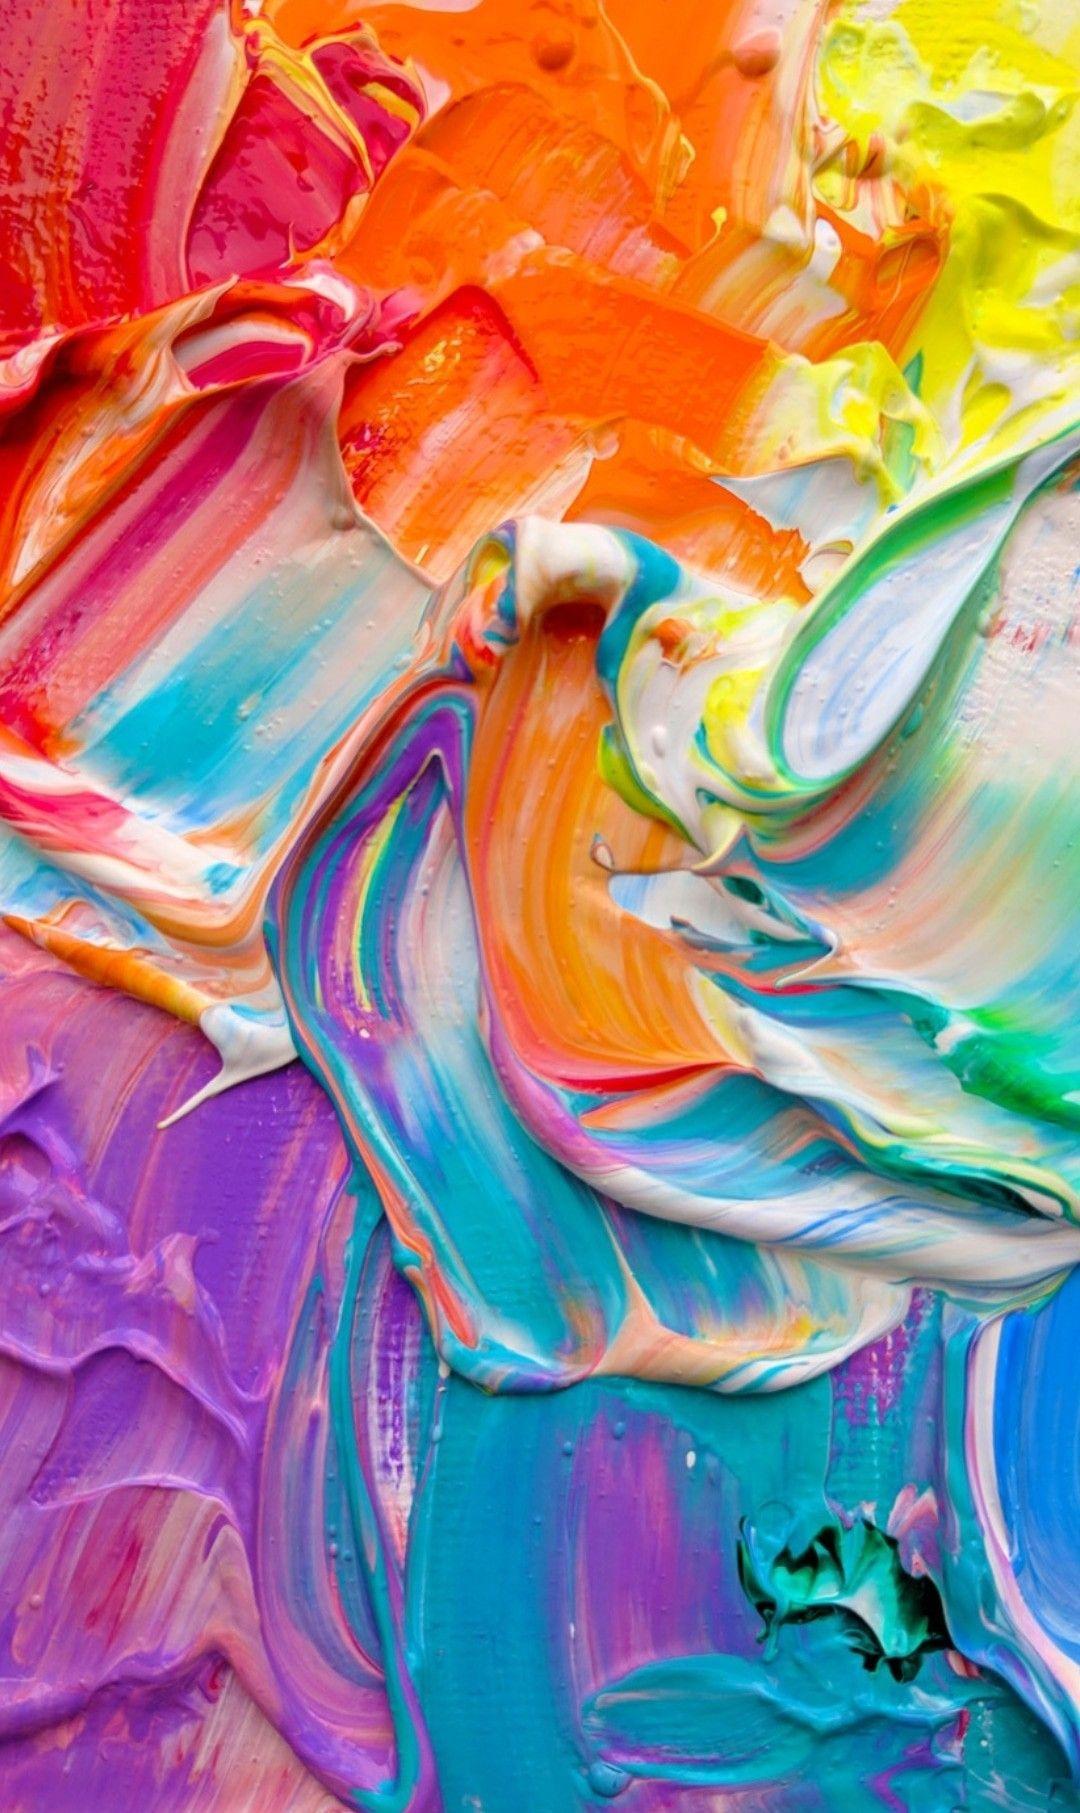 Sarah Coey Art Paint Swirl Free Wallpaper Phone Wallpapers I Art Wallpaper Iphone Artistic Wallpaper Painting Wallpaper